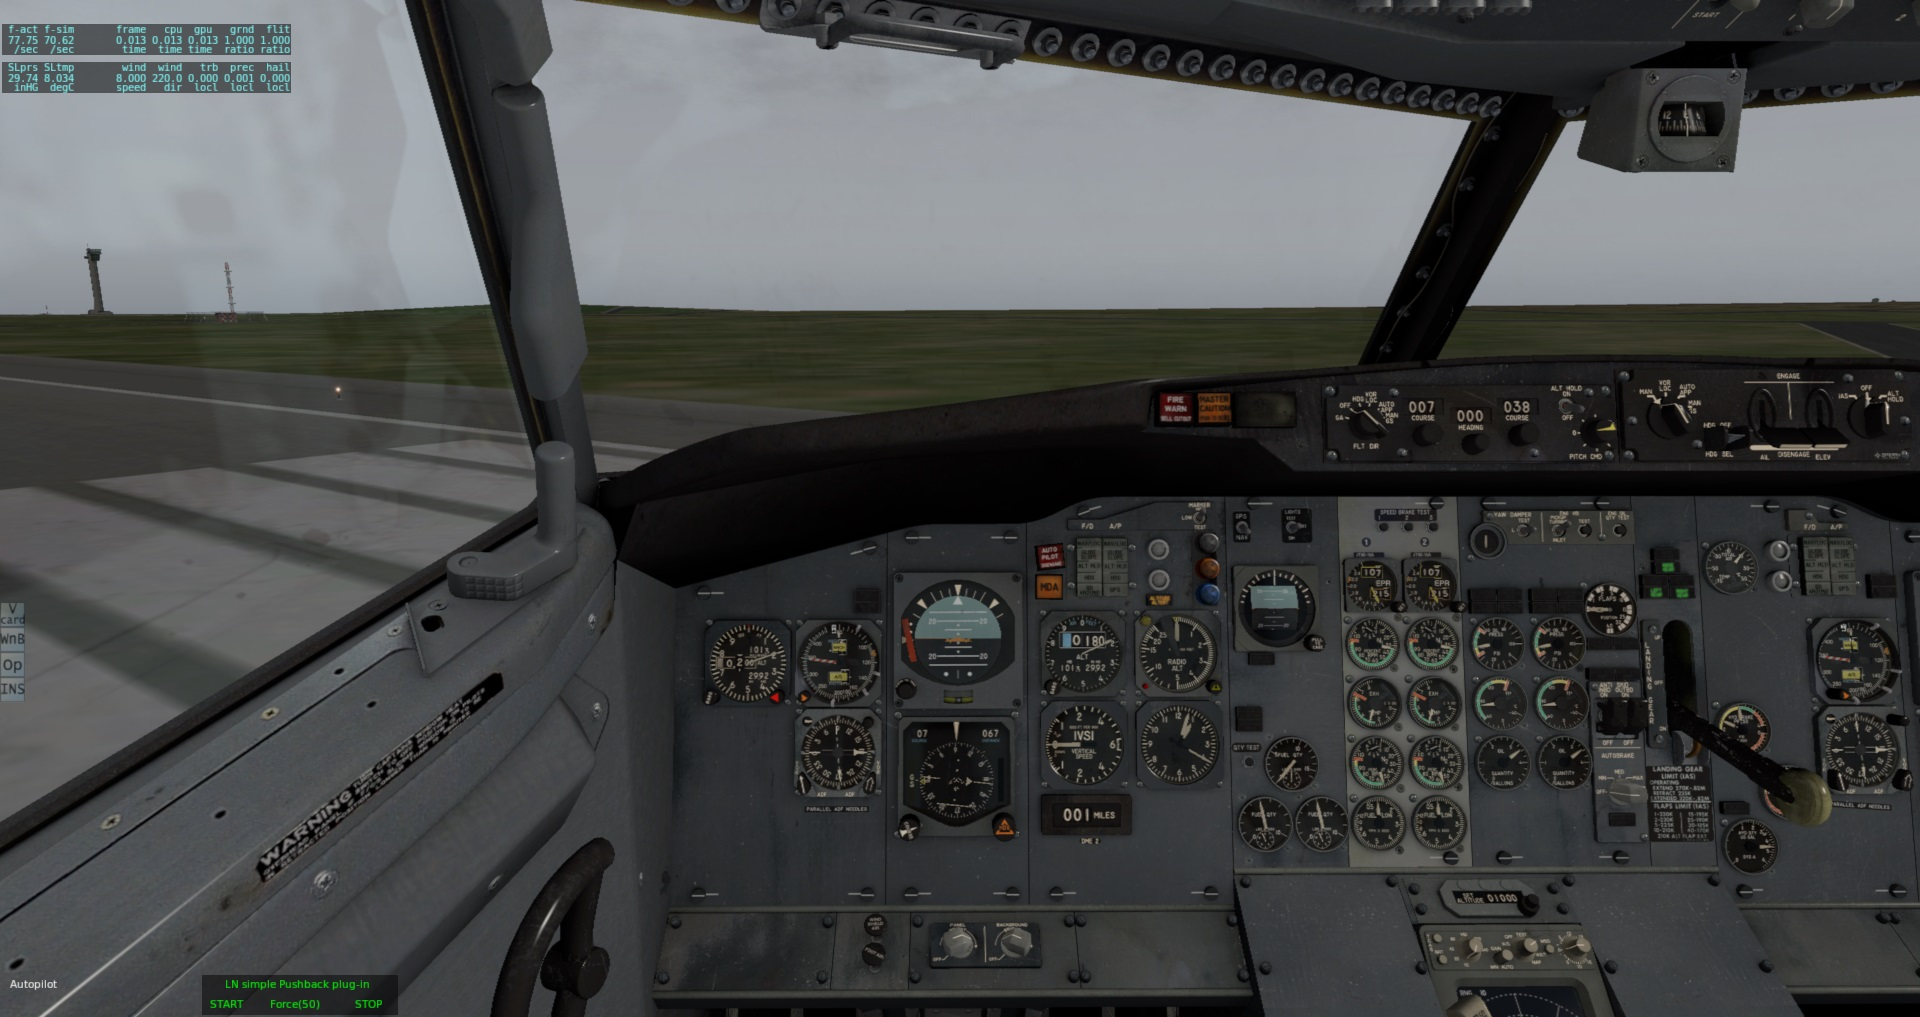 LN_Simple_Pushback - Utilities - X-Plane Org Forum